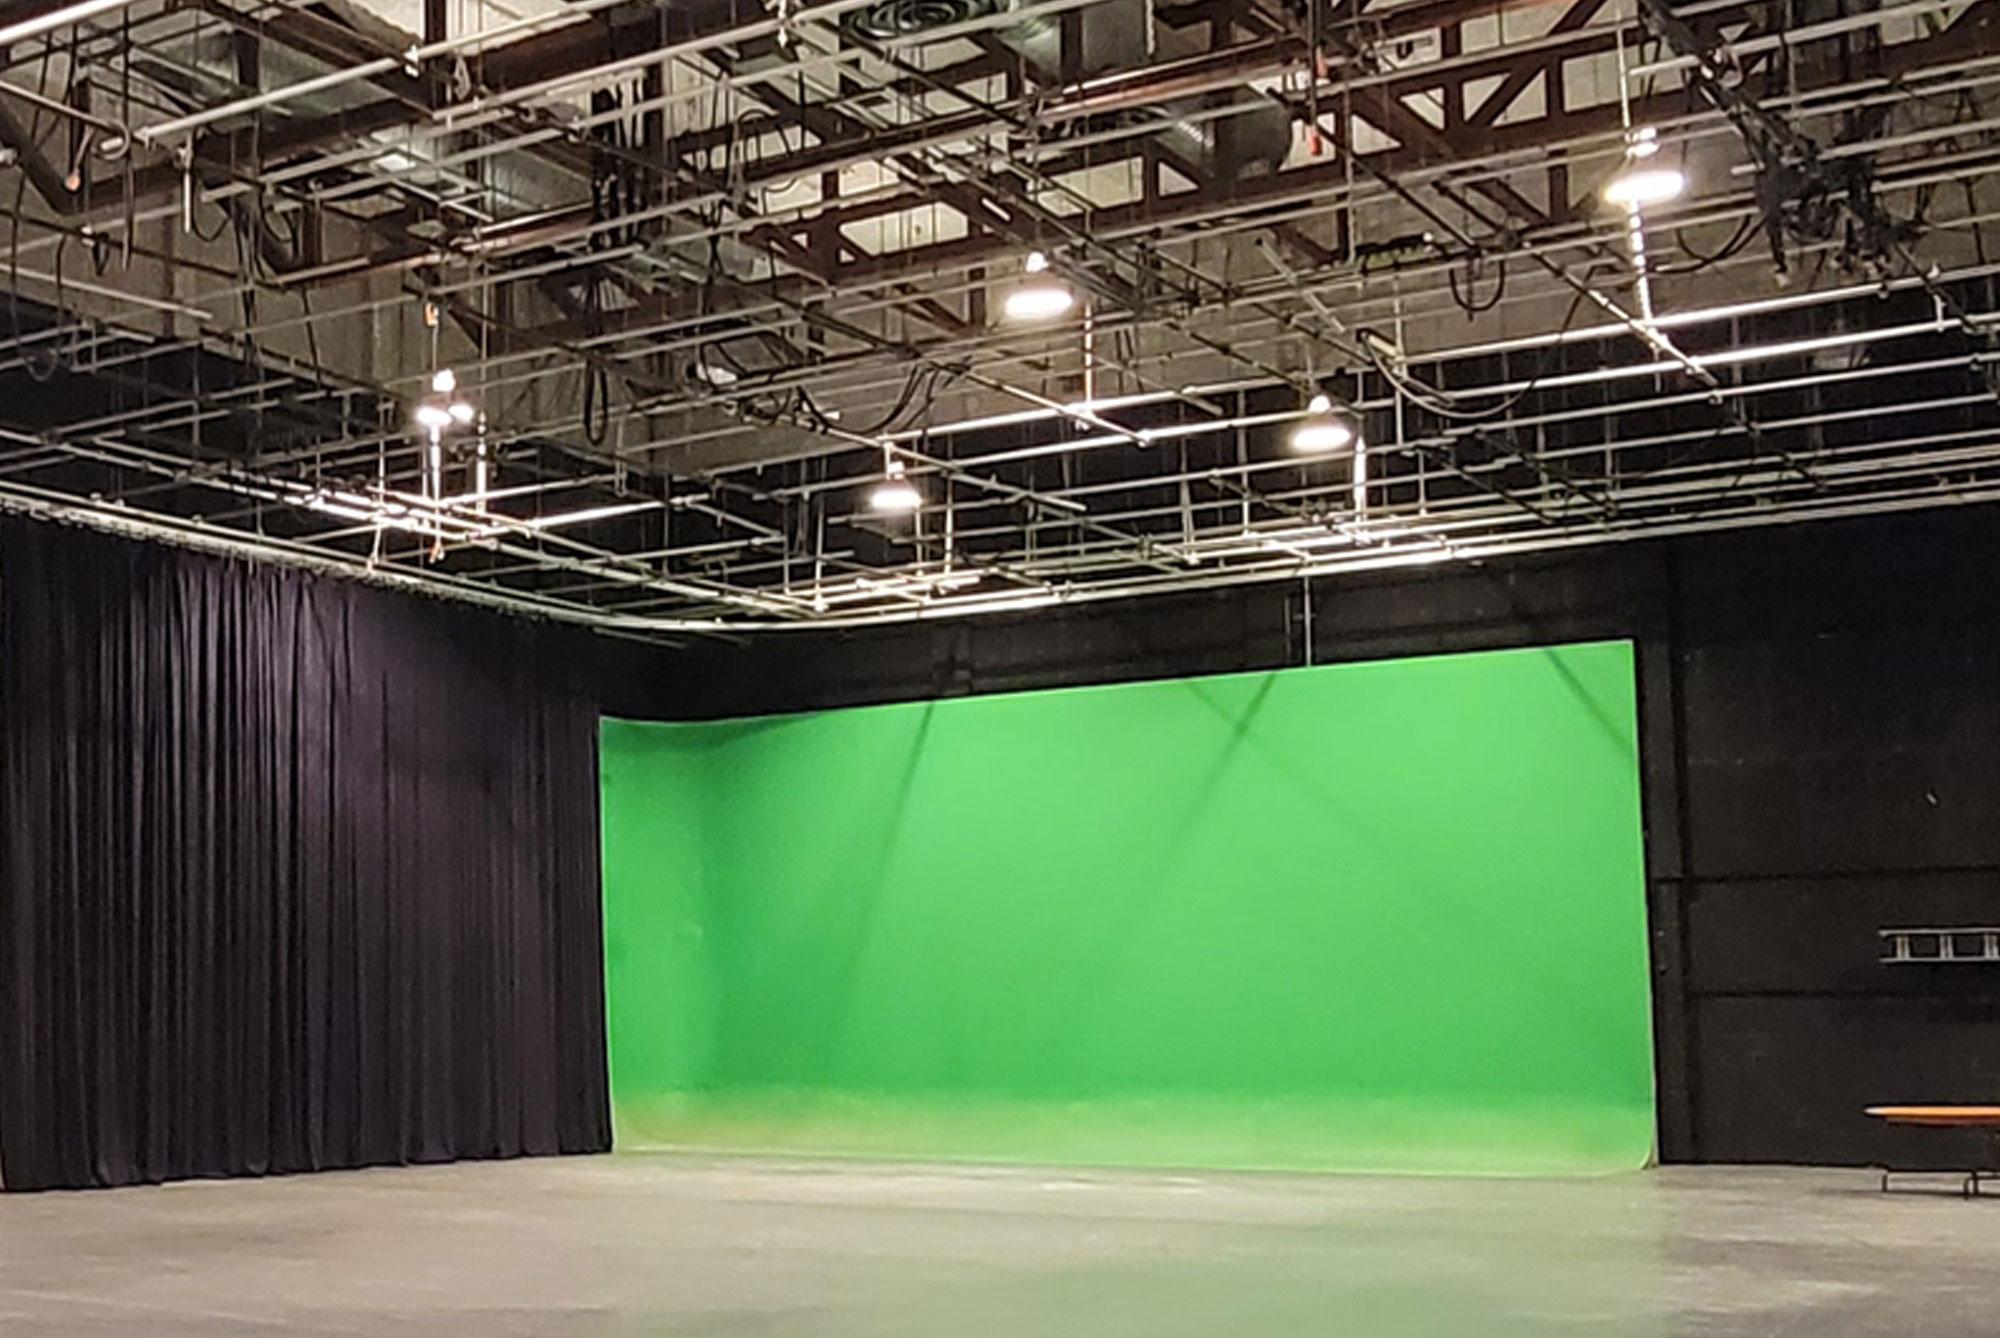 NUVO Network - Green Screen Studios